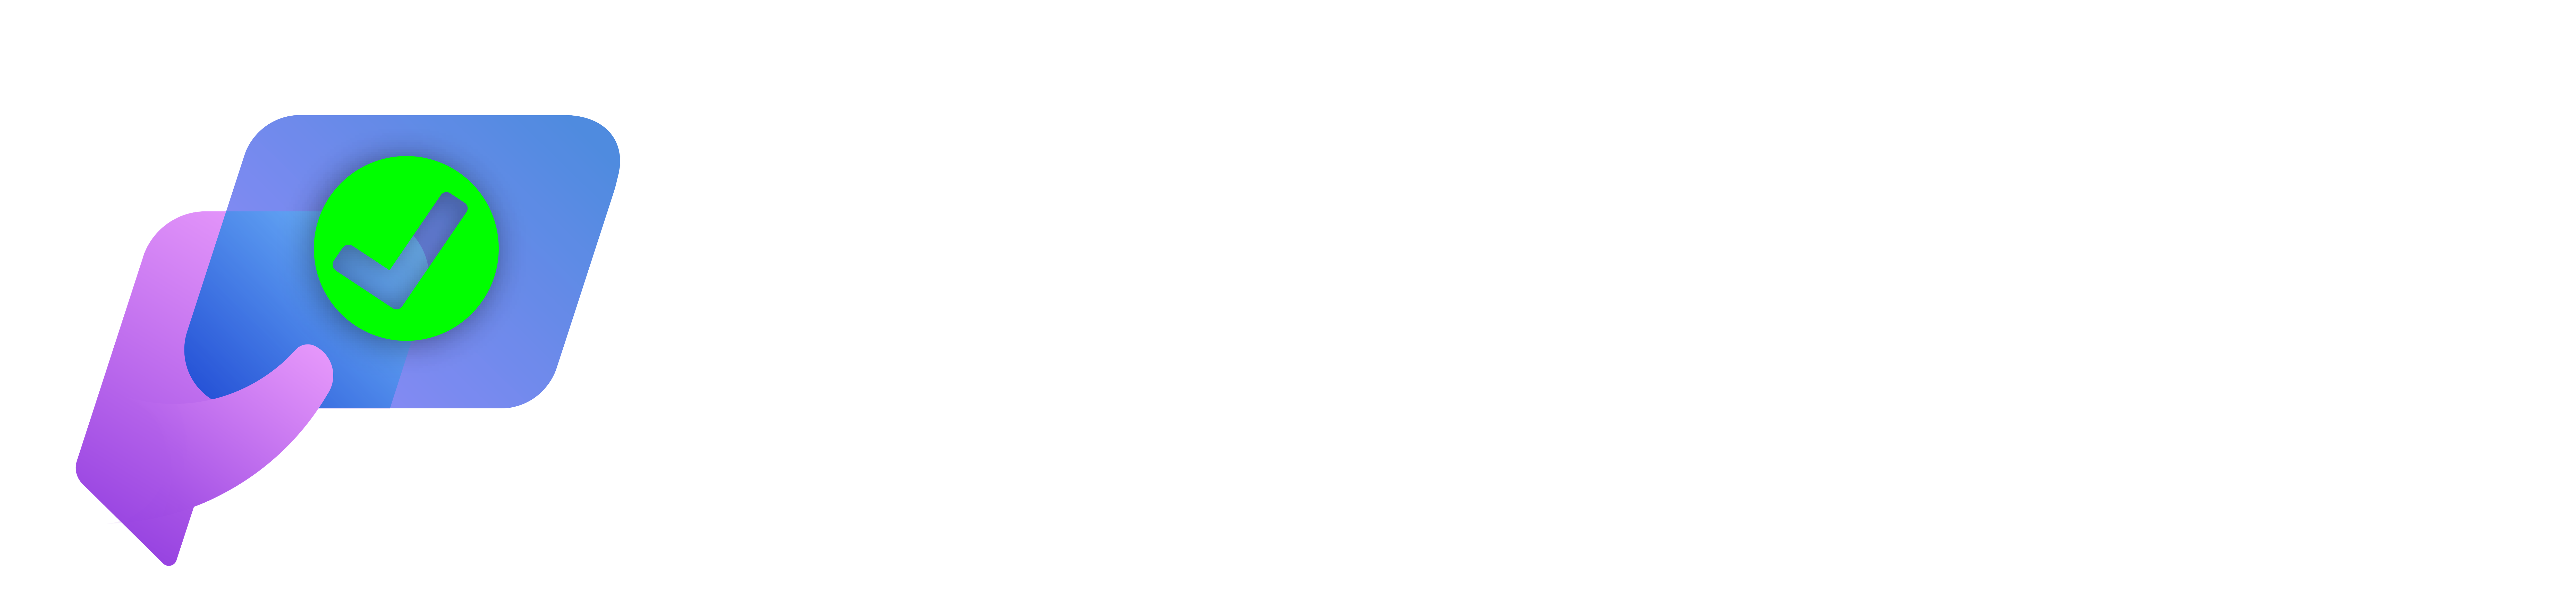 Gateway24h | Compre Stripe verificado, PayPal, Square, Authorize.net … No se necesita identificación.